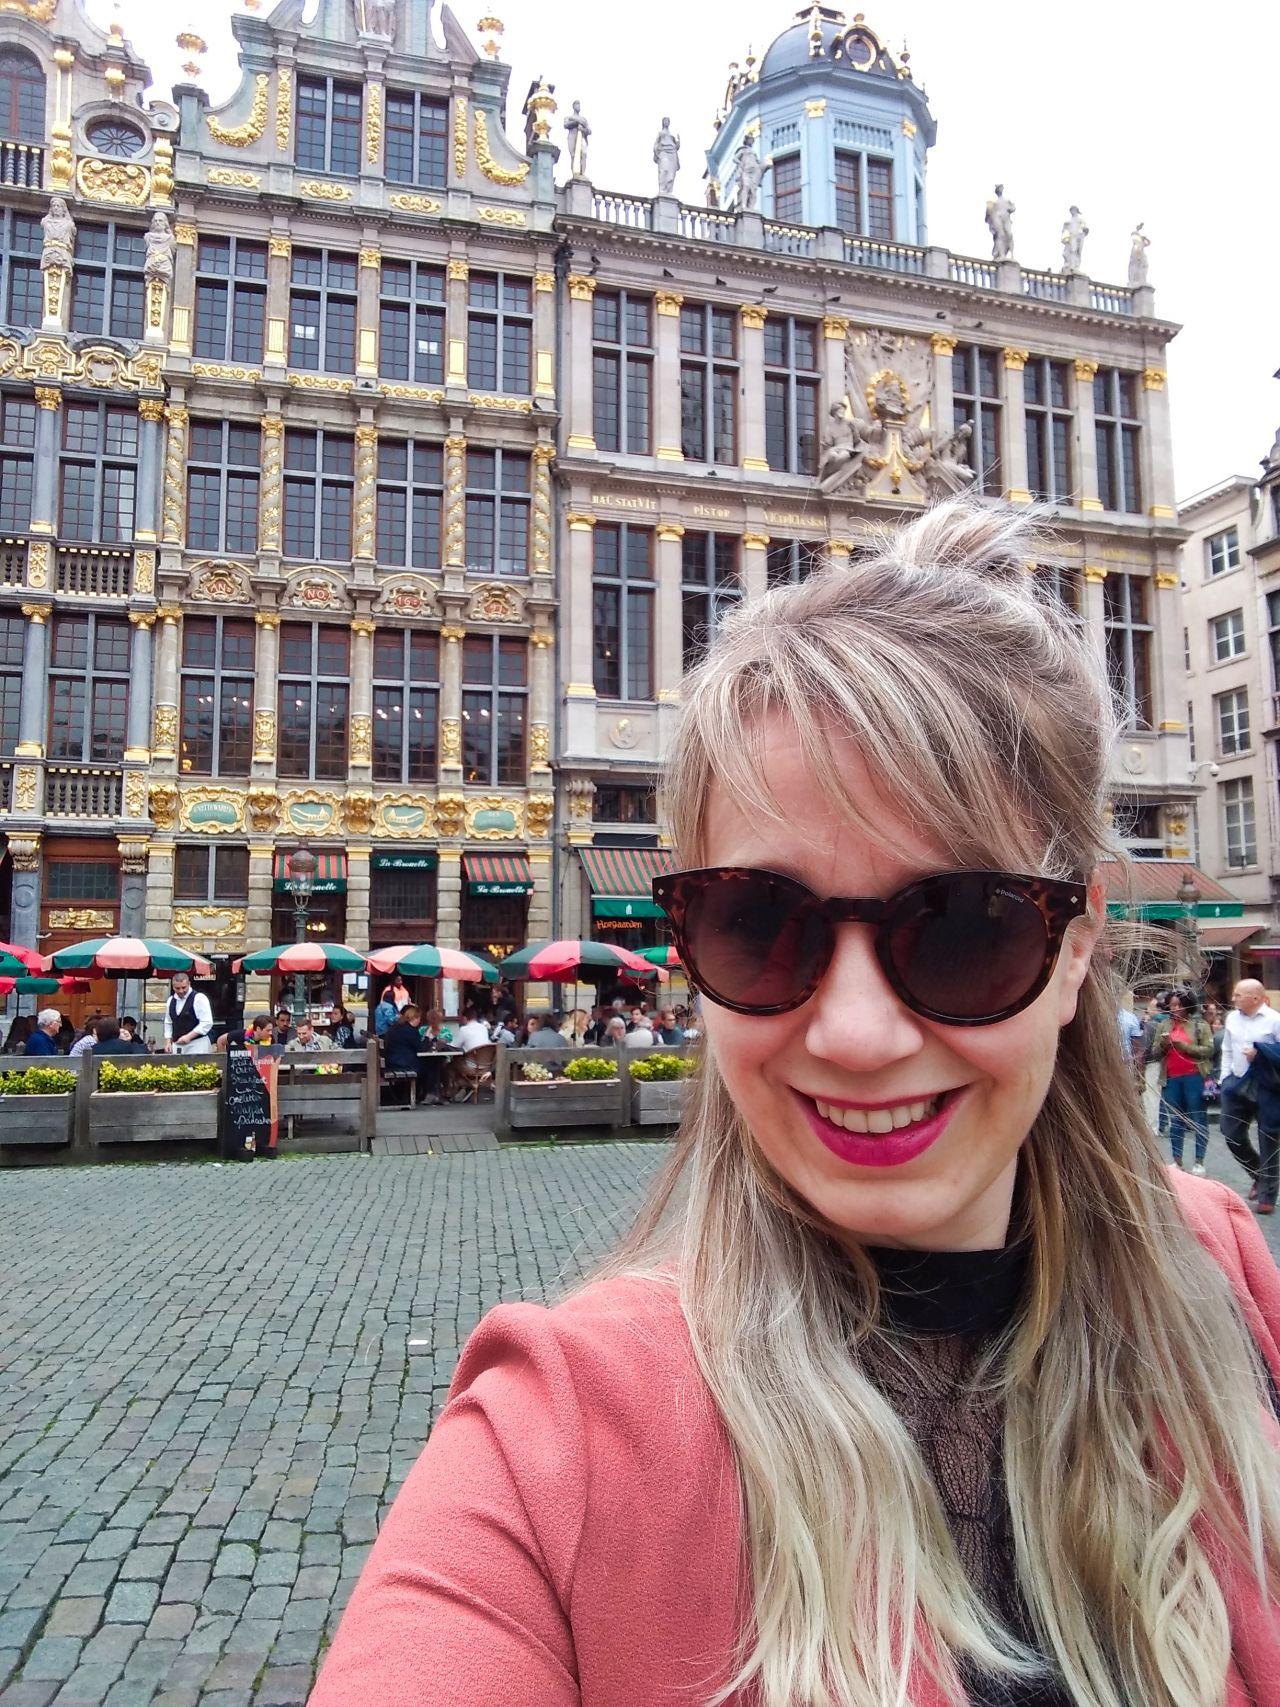 Brussel Grote Markt1